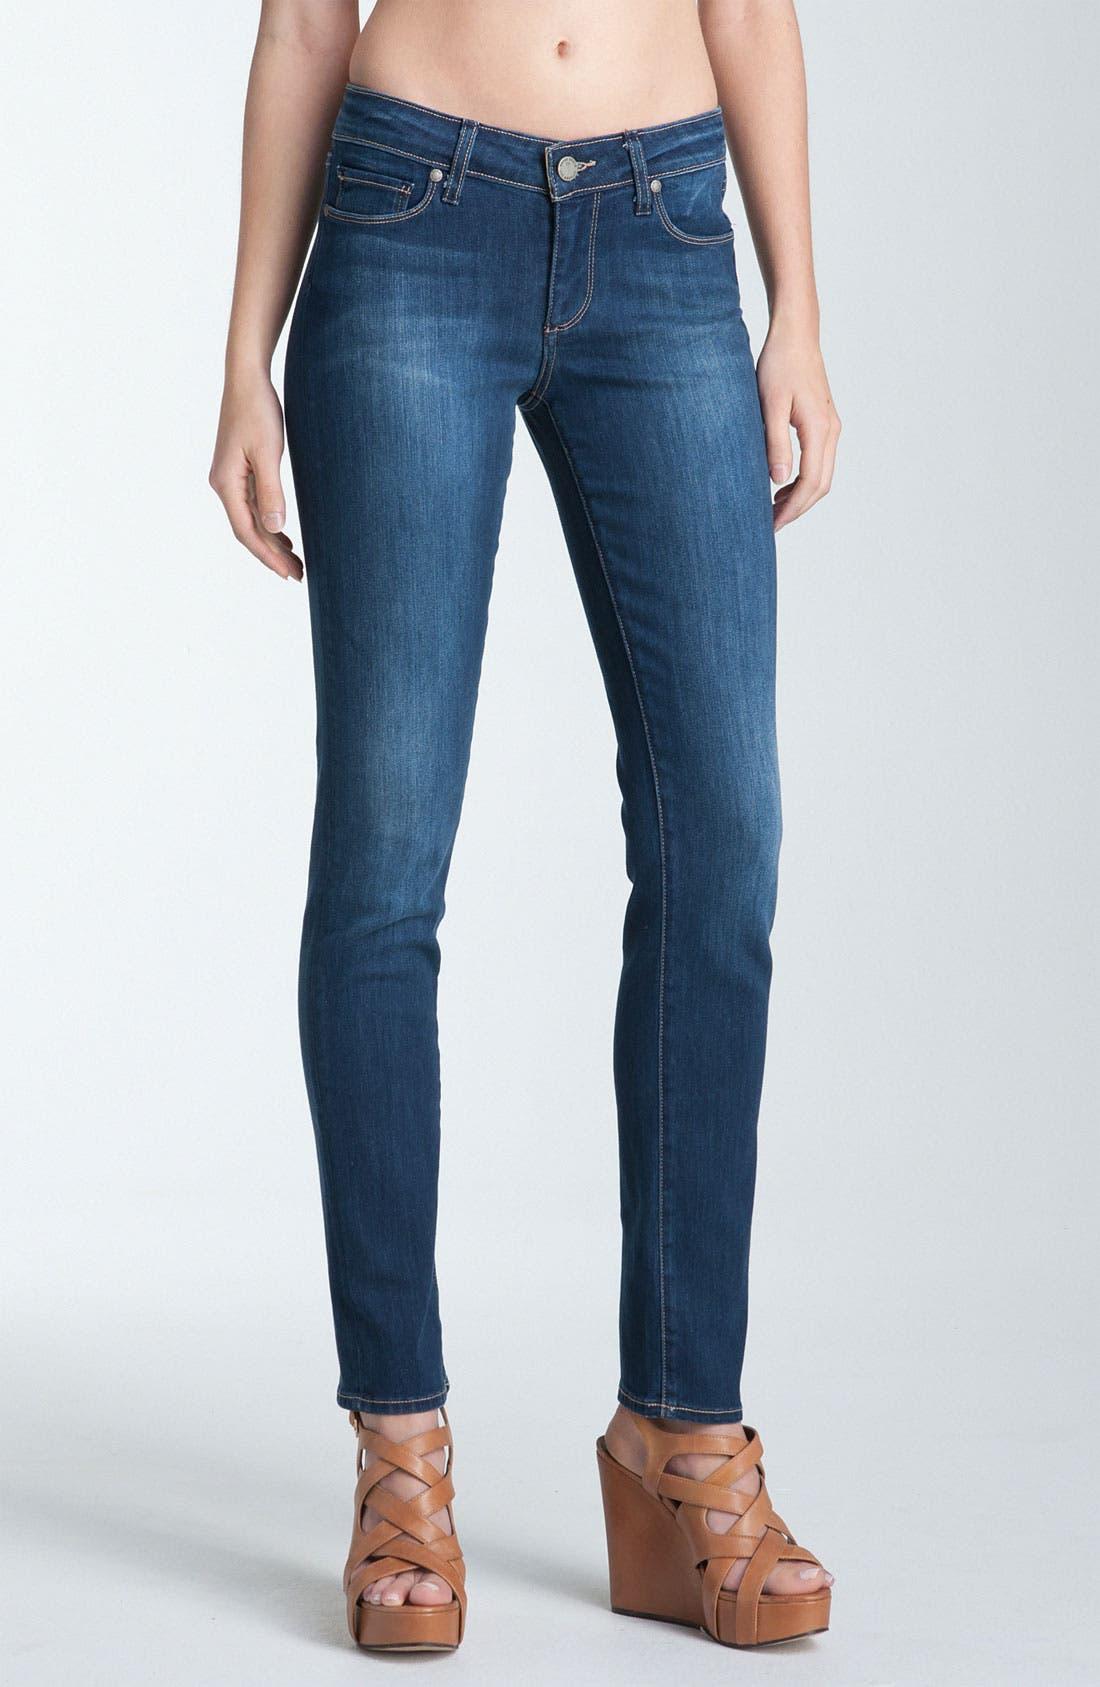 Main Image - Paige Denim 'Skyline' Skinny Jeans (Ravine)